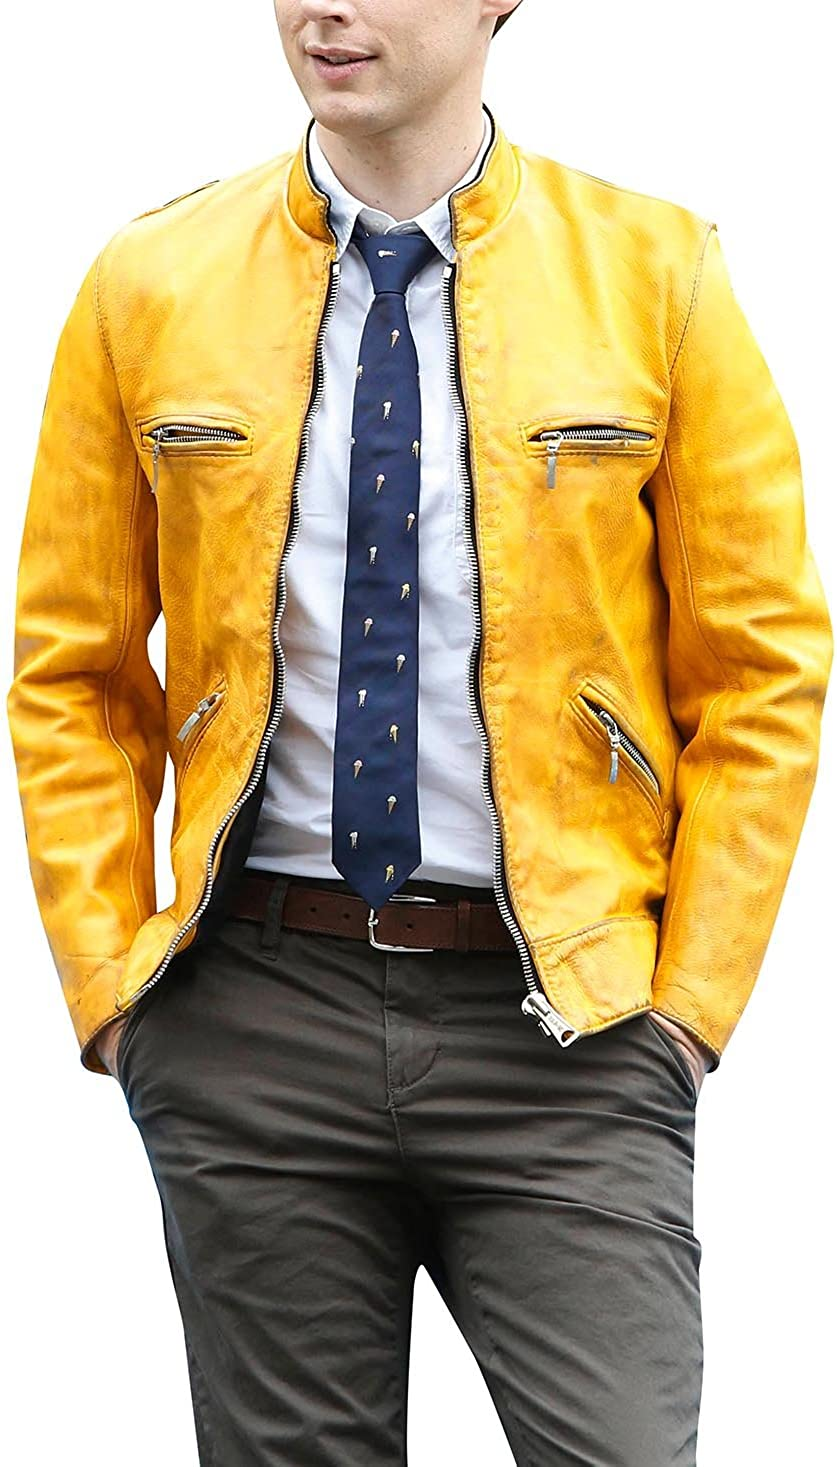 Spazeup Dirk Detective Yellow Leather Gentlys Agency Jacket